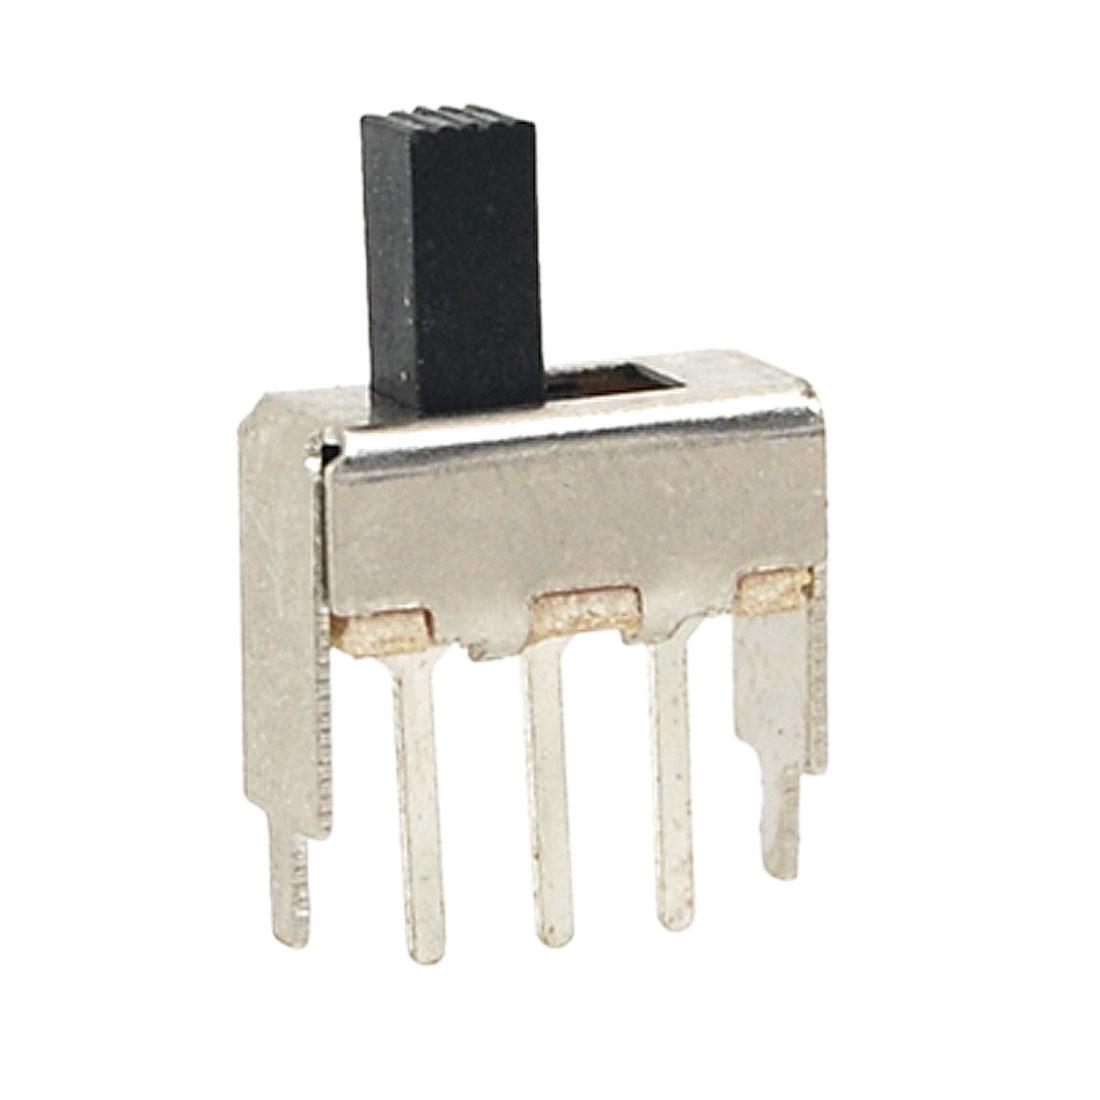 10 Pcs 6mm Height Knob 3 Pin 2 Position 1P2T SPDT Mini Slide Switch 0.5A 50V DC